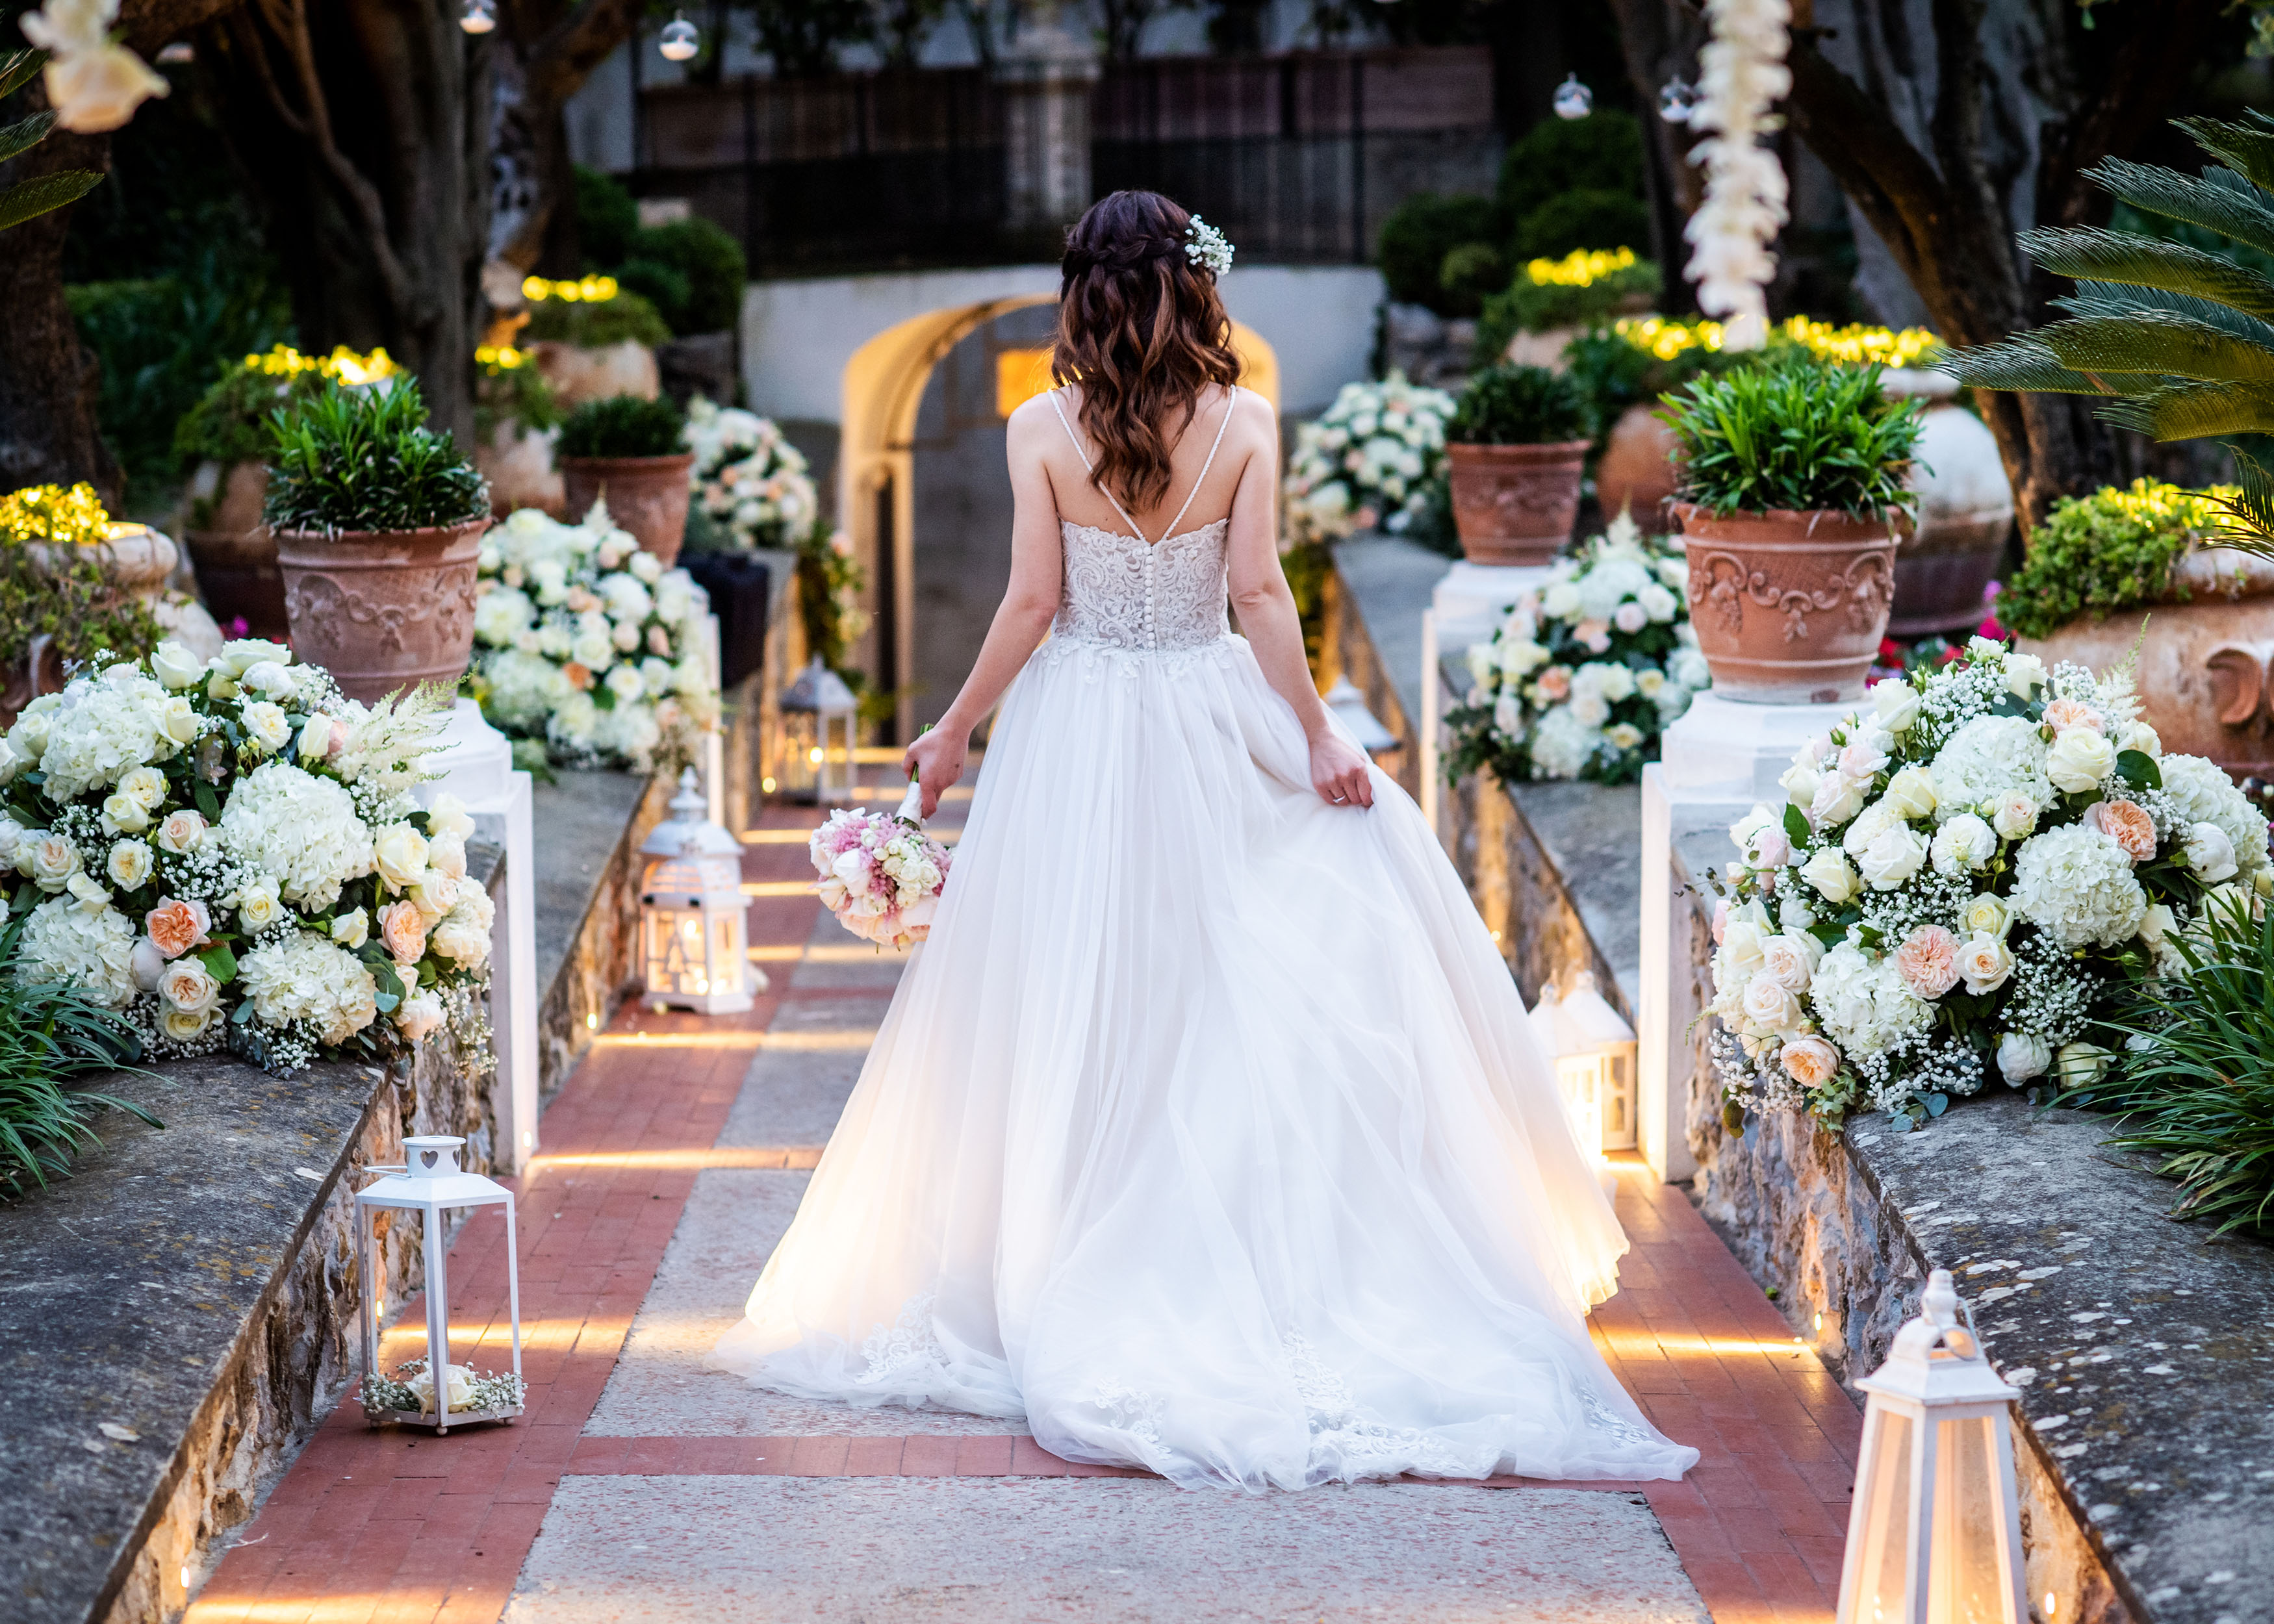 http://www.weddingamalfi.com/wp-content/uploads/Katia-Jorge-18-maggio-2019-41.jpg